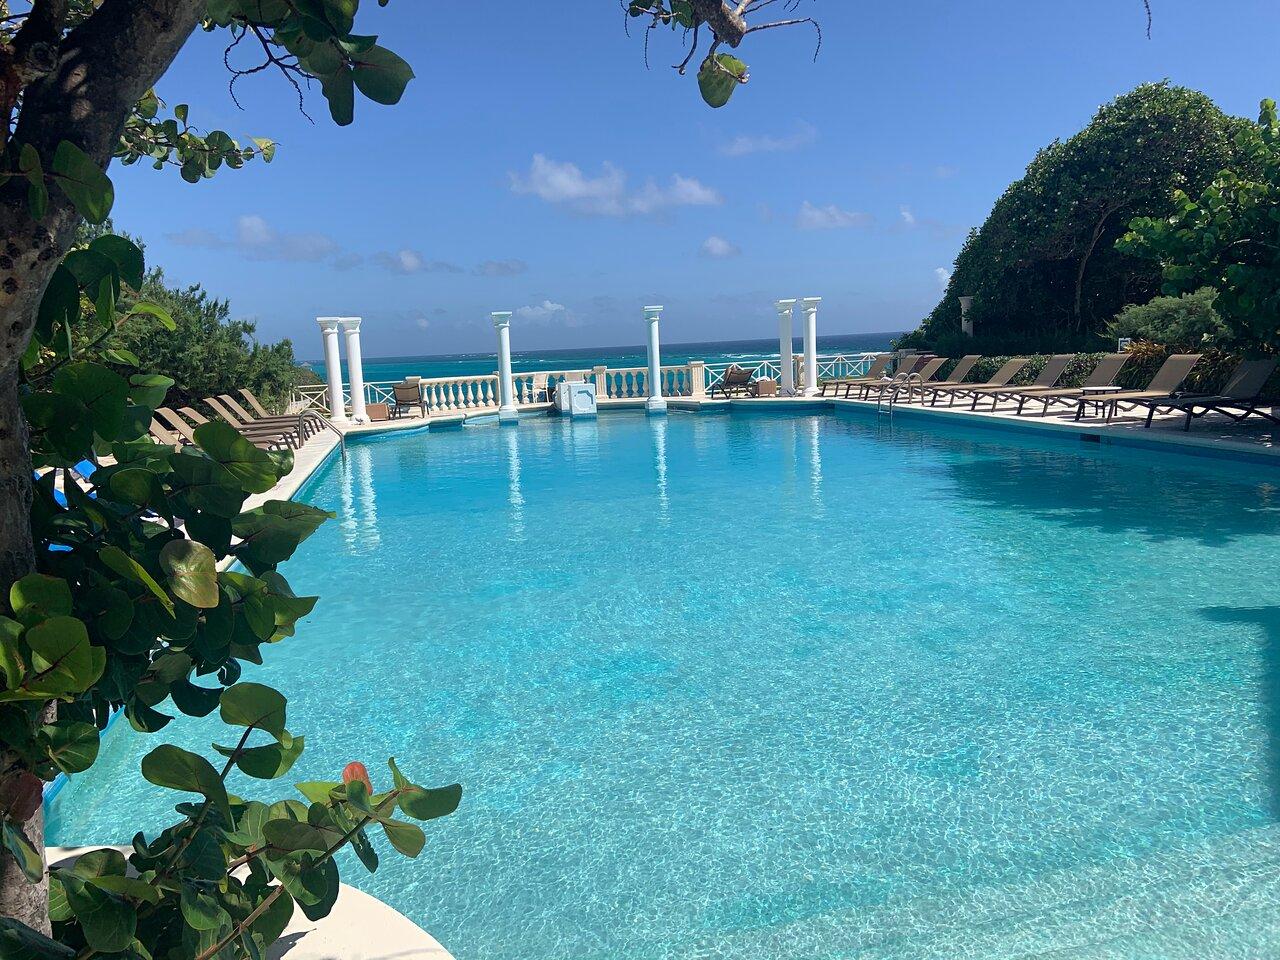 The Crane Resort Pool Area